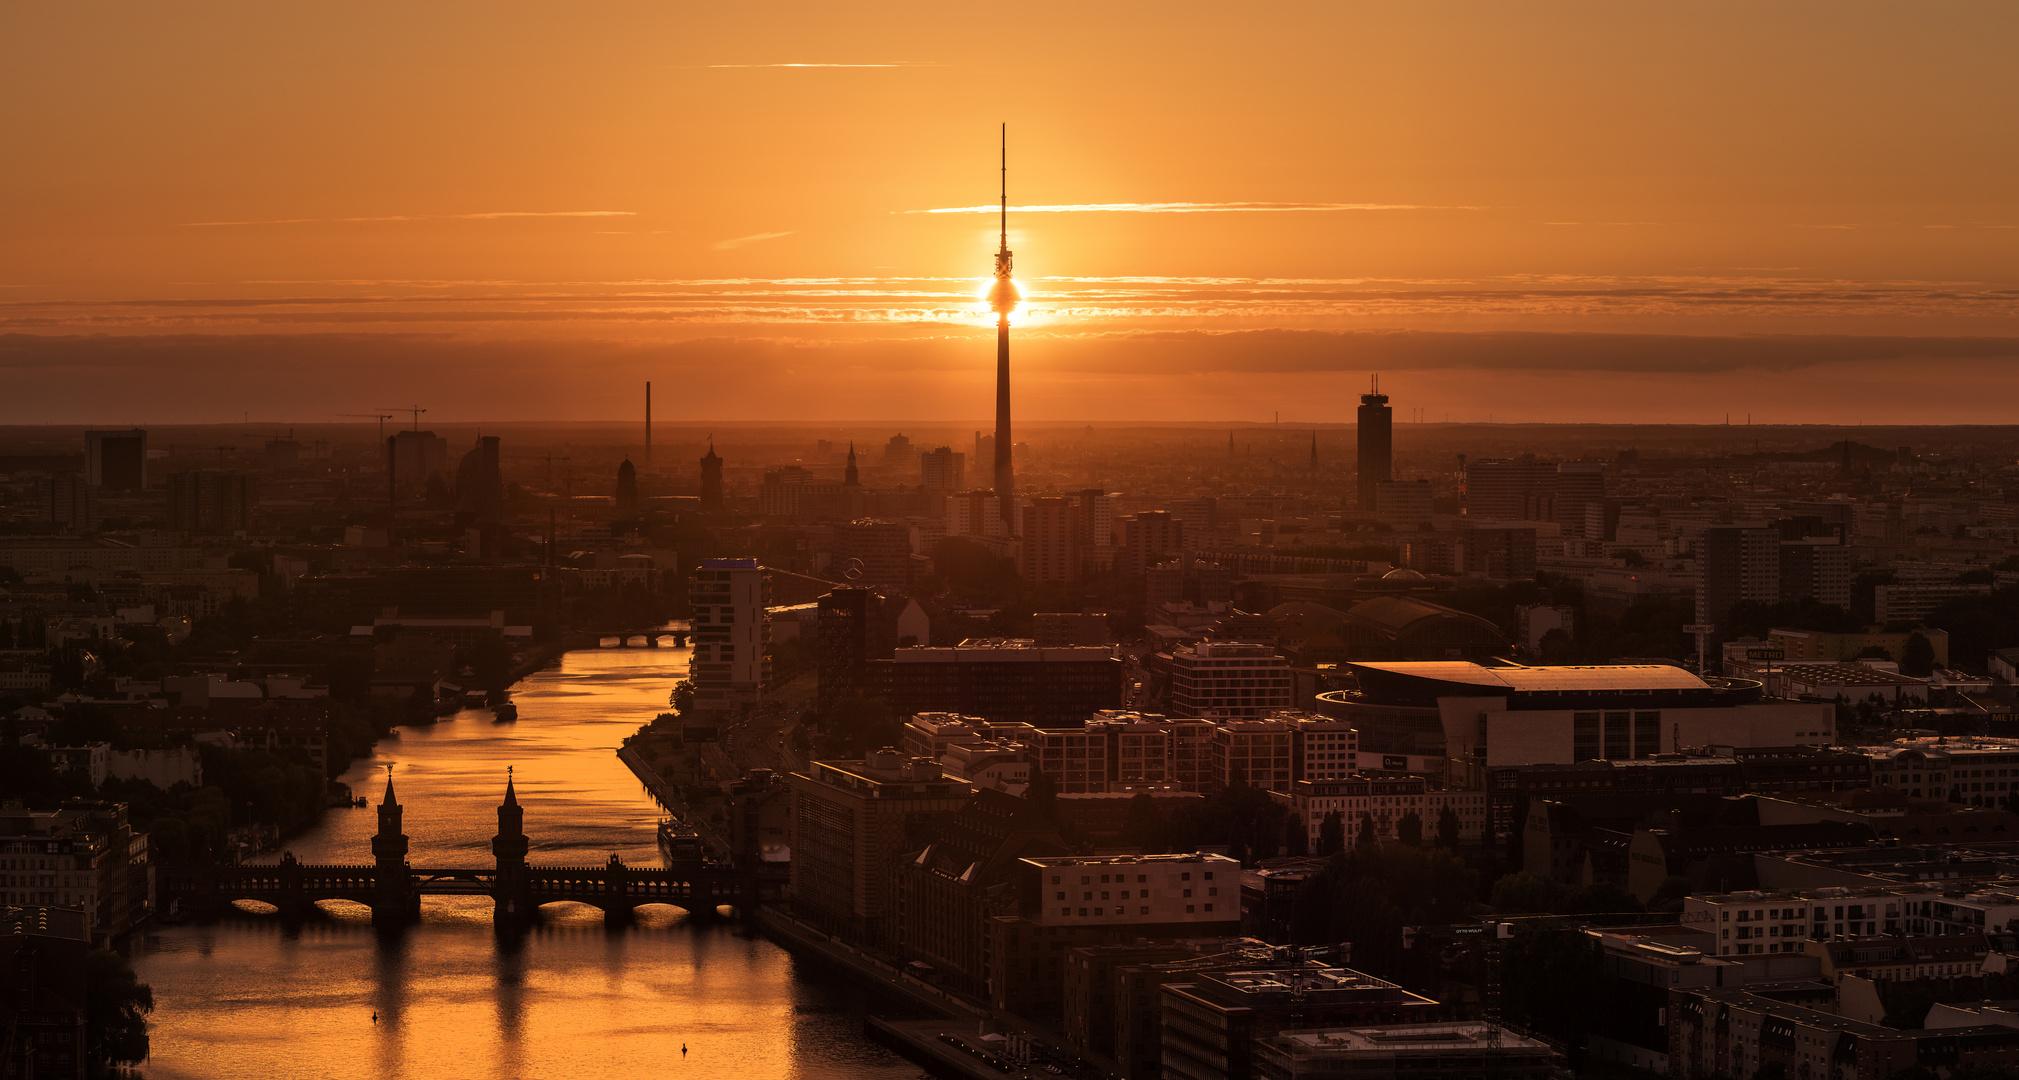 Berlin - Total Eclipse of my Heart